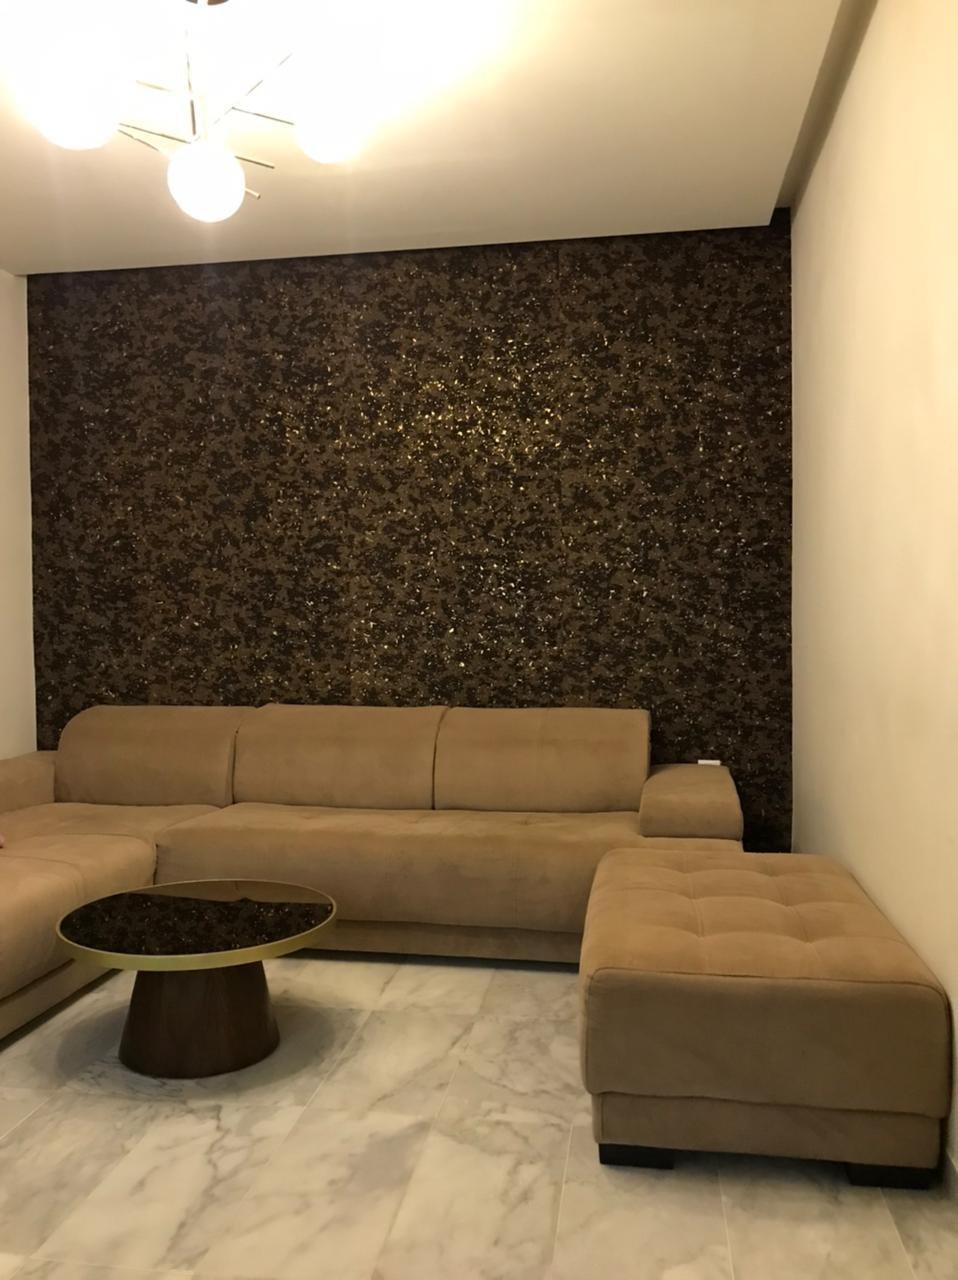 Rental Apartment - La Soukra - Tunisia